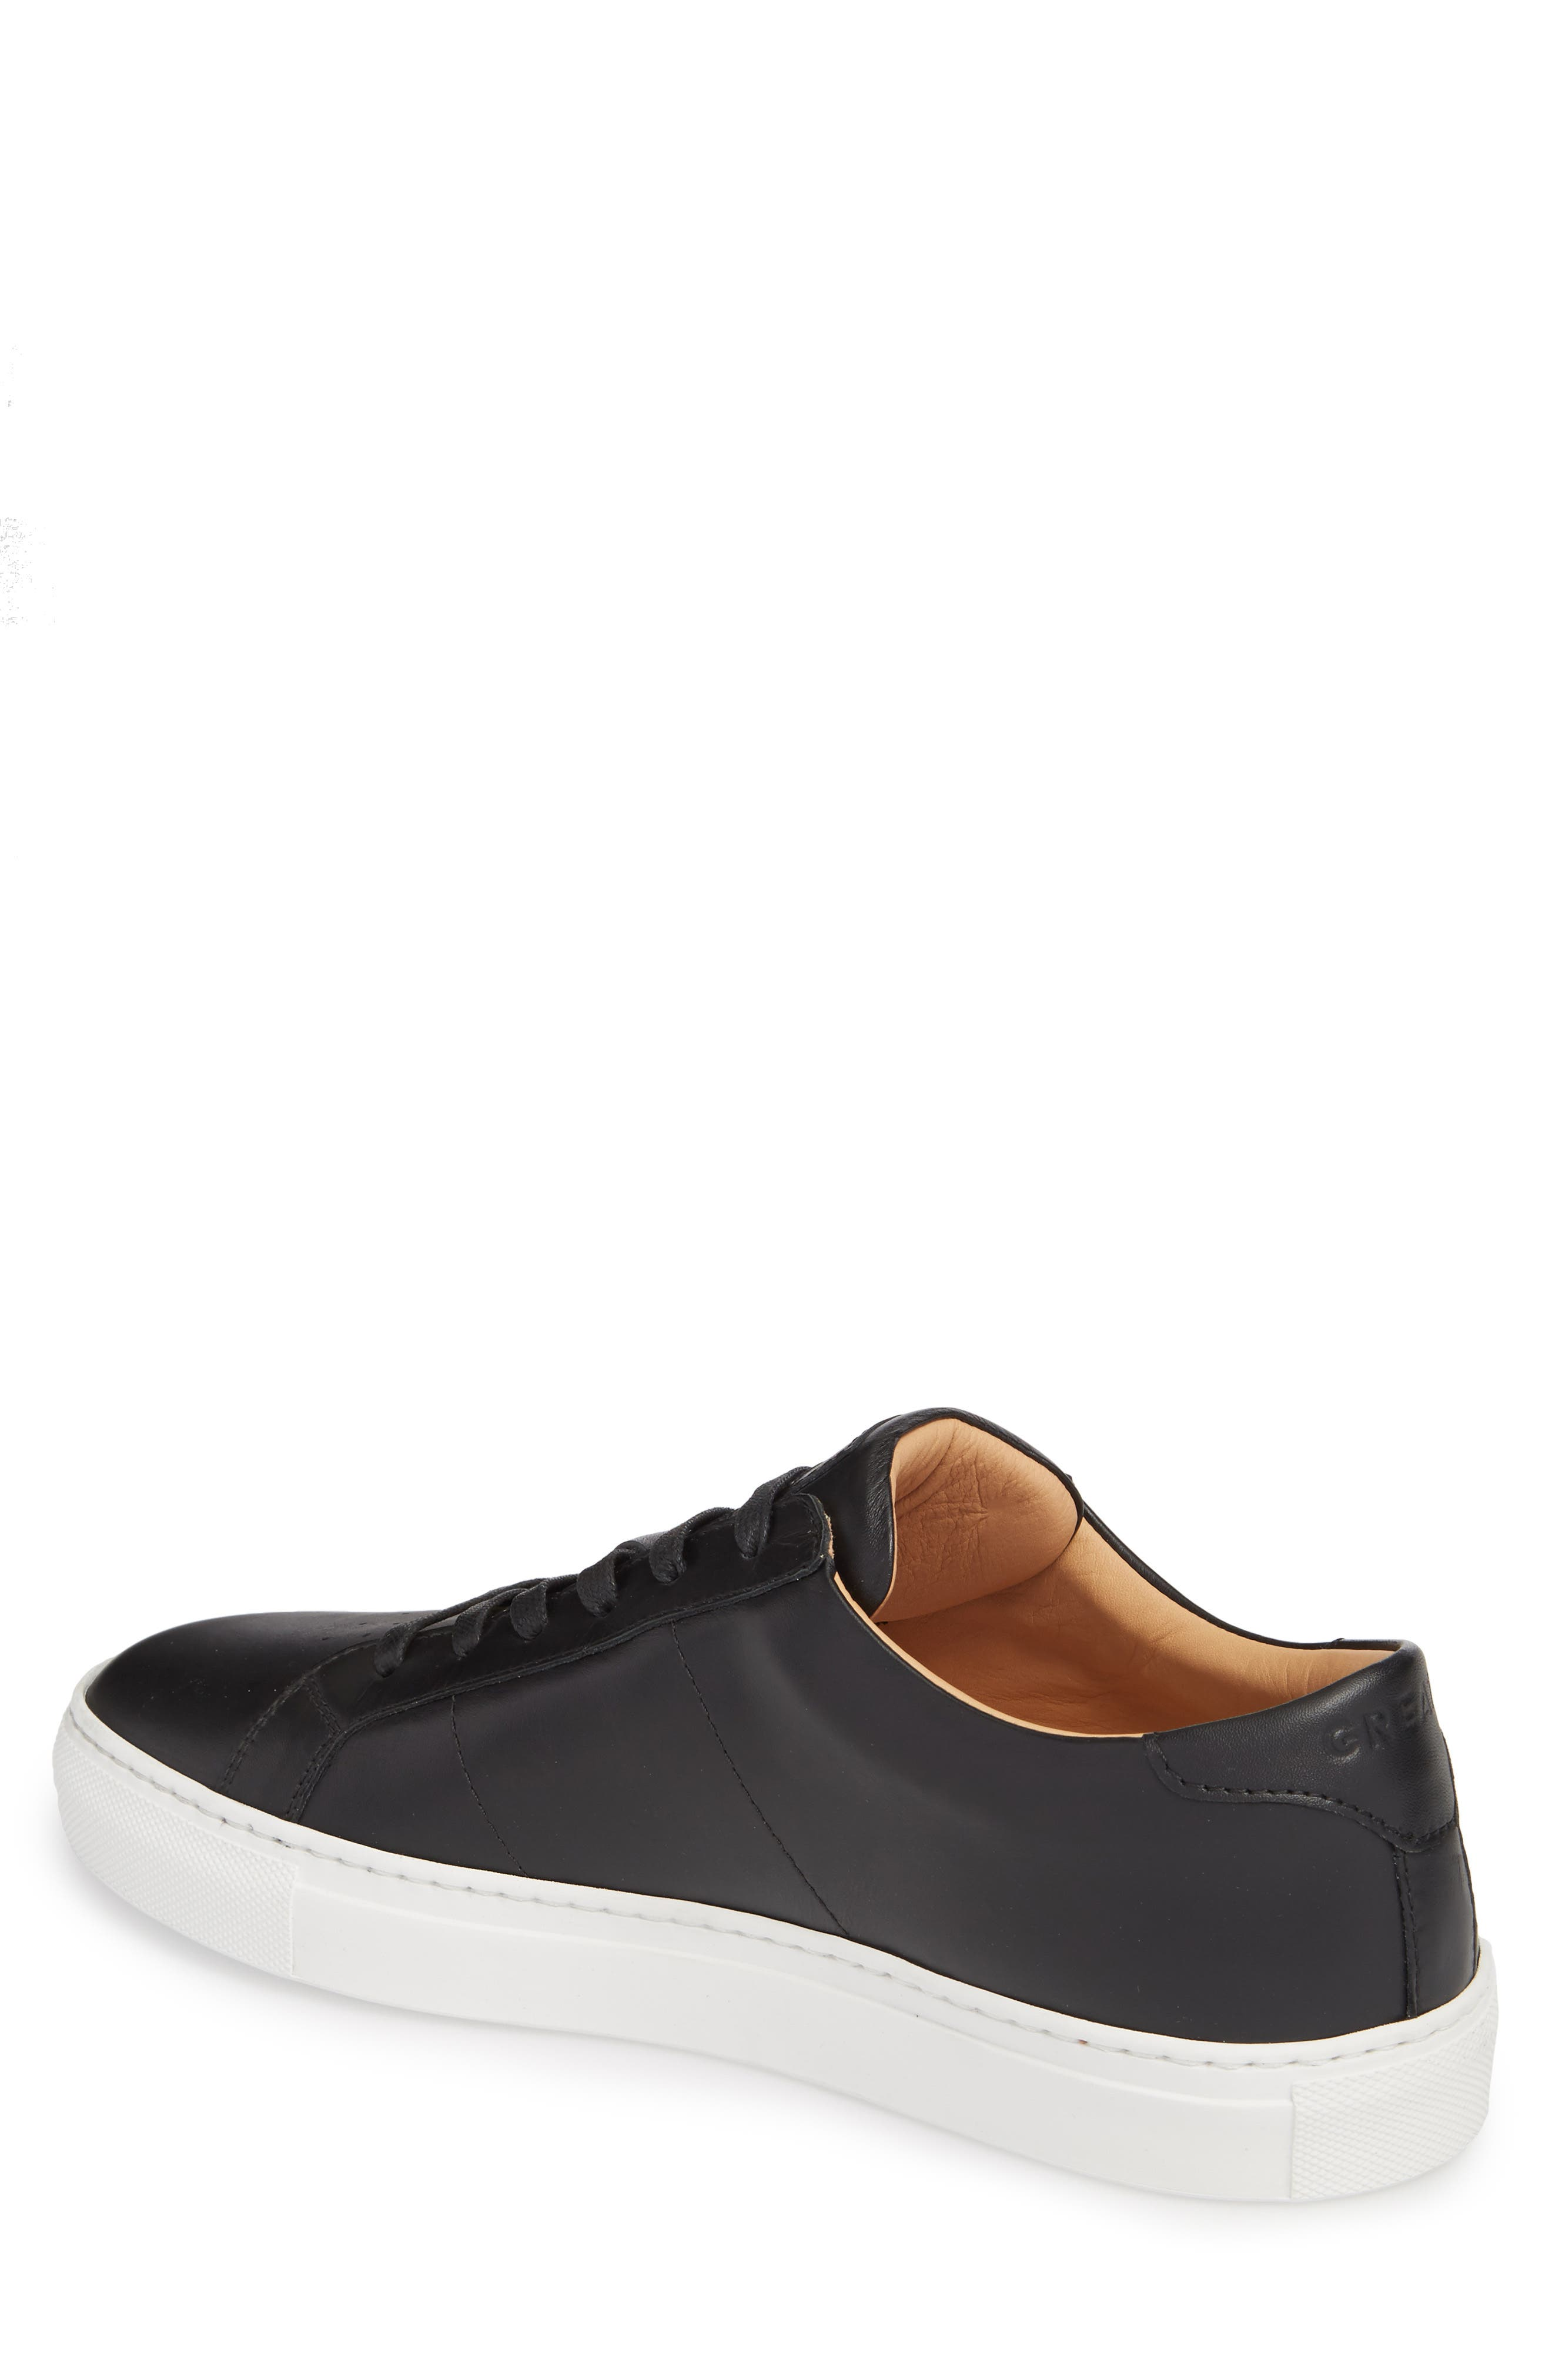 Royale Sneaker,                             Alternate thumbnail 2, color,                             BLACK LEATHER